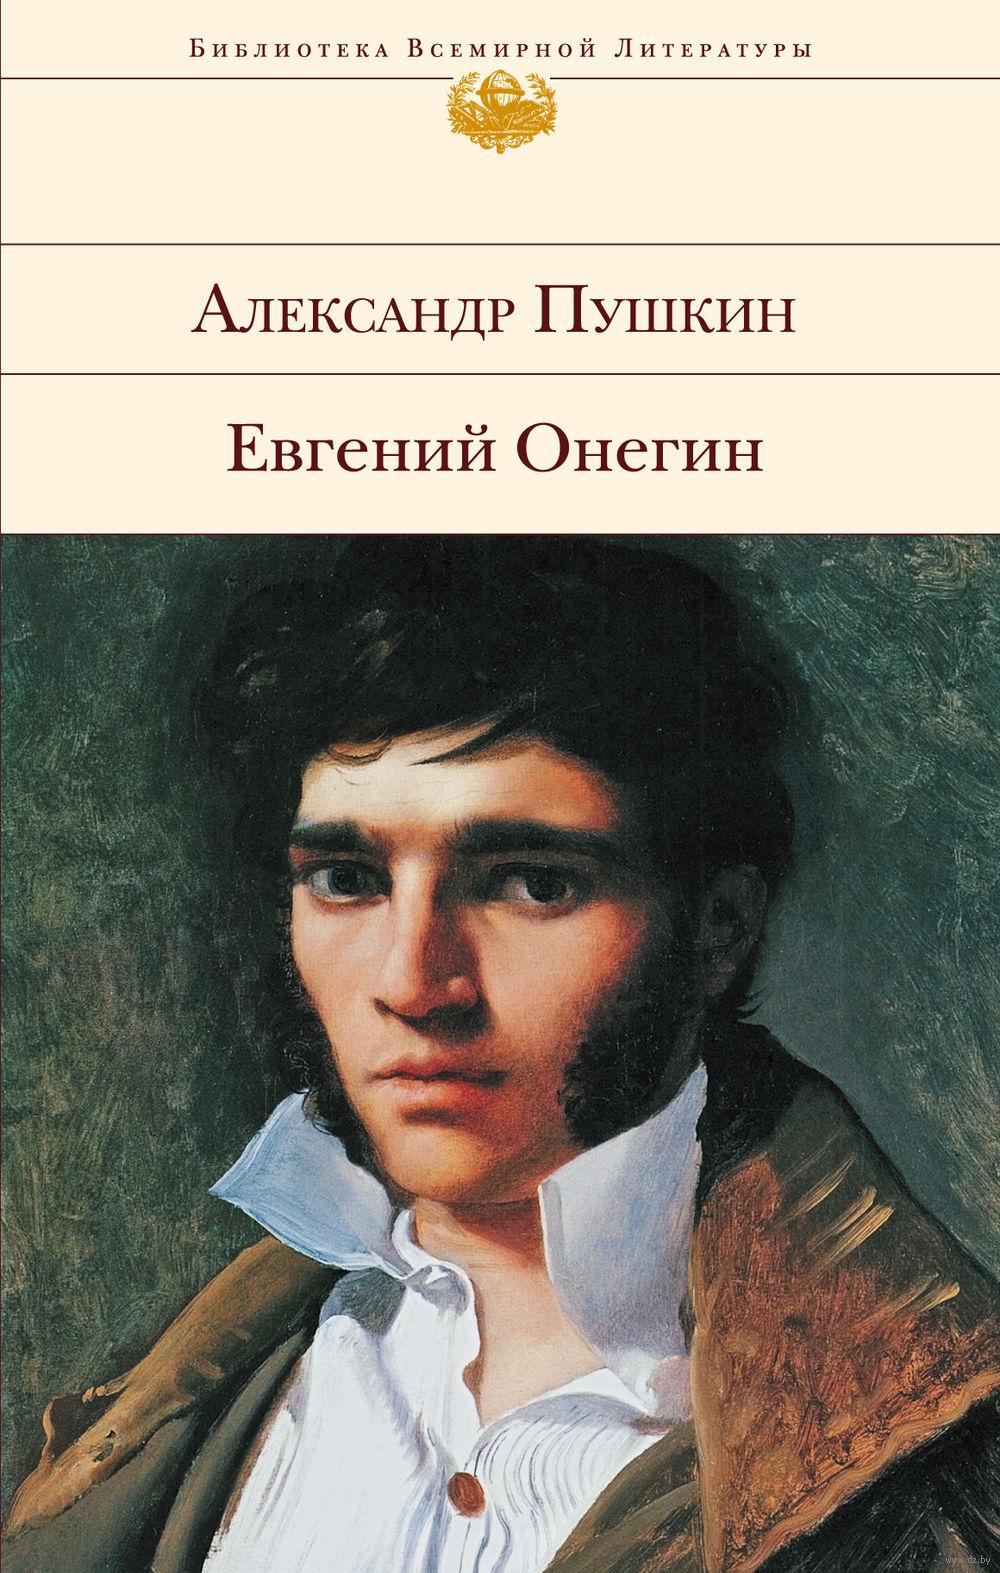 Тайна романа «Евгений Онегин»